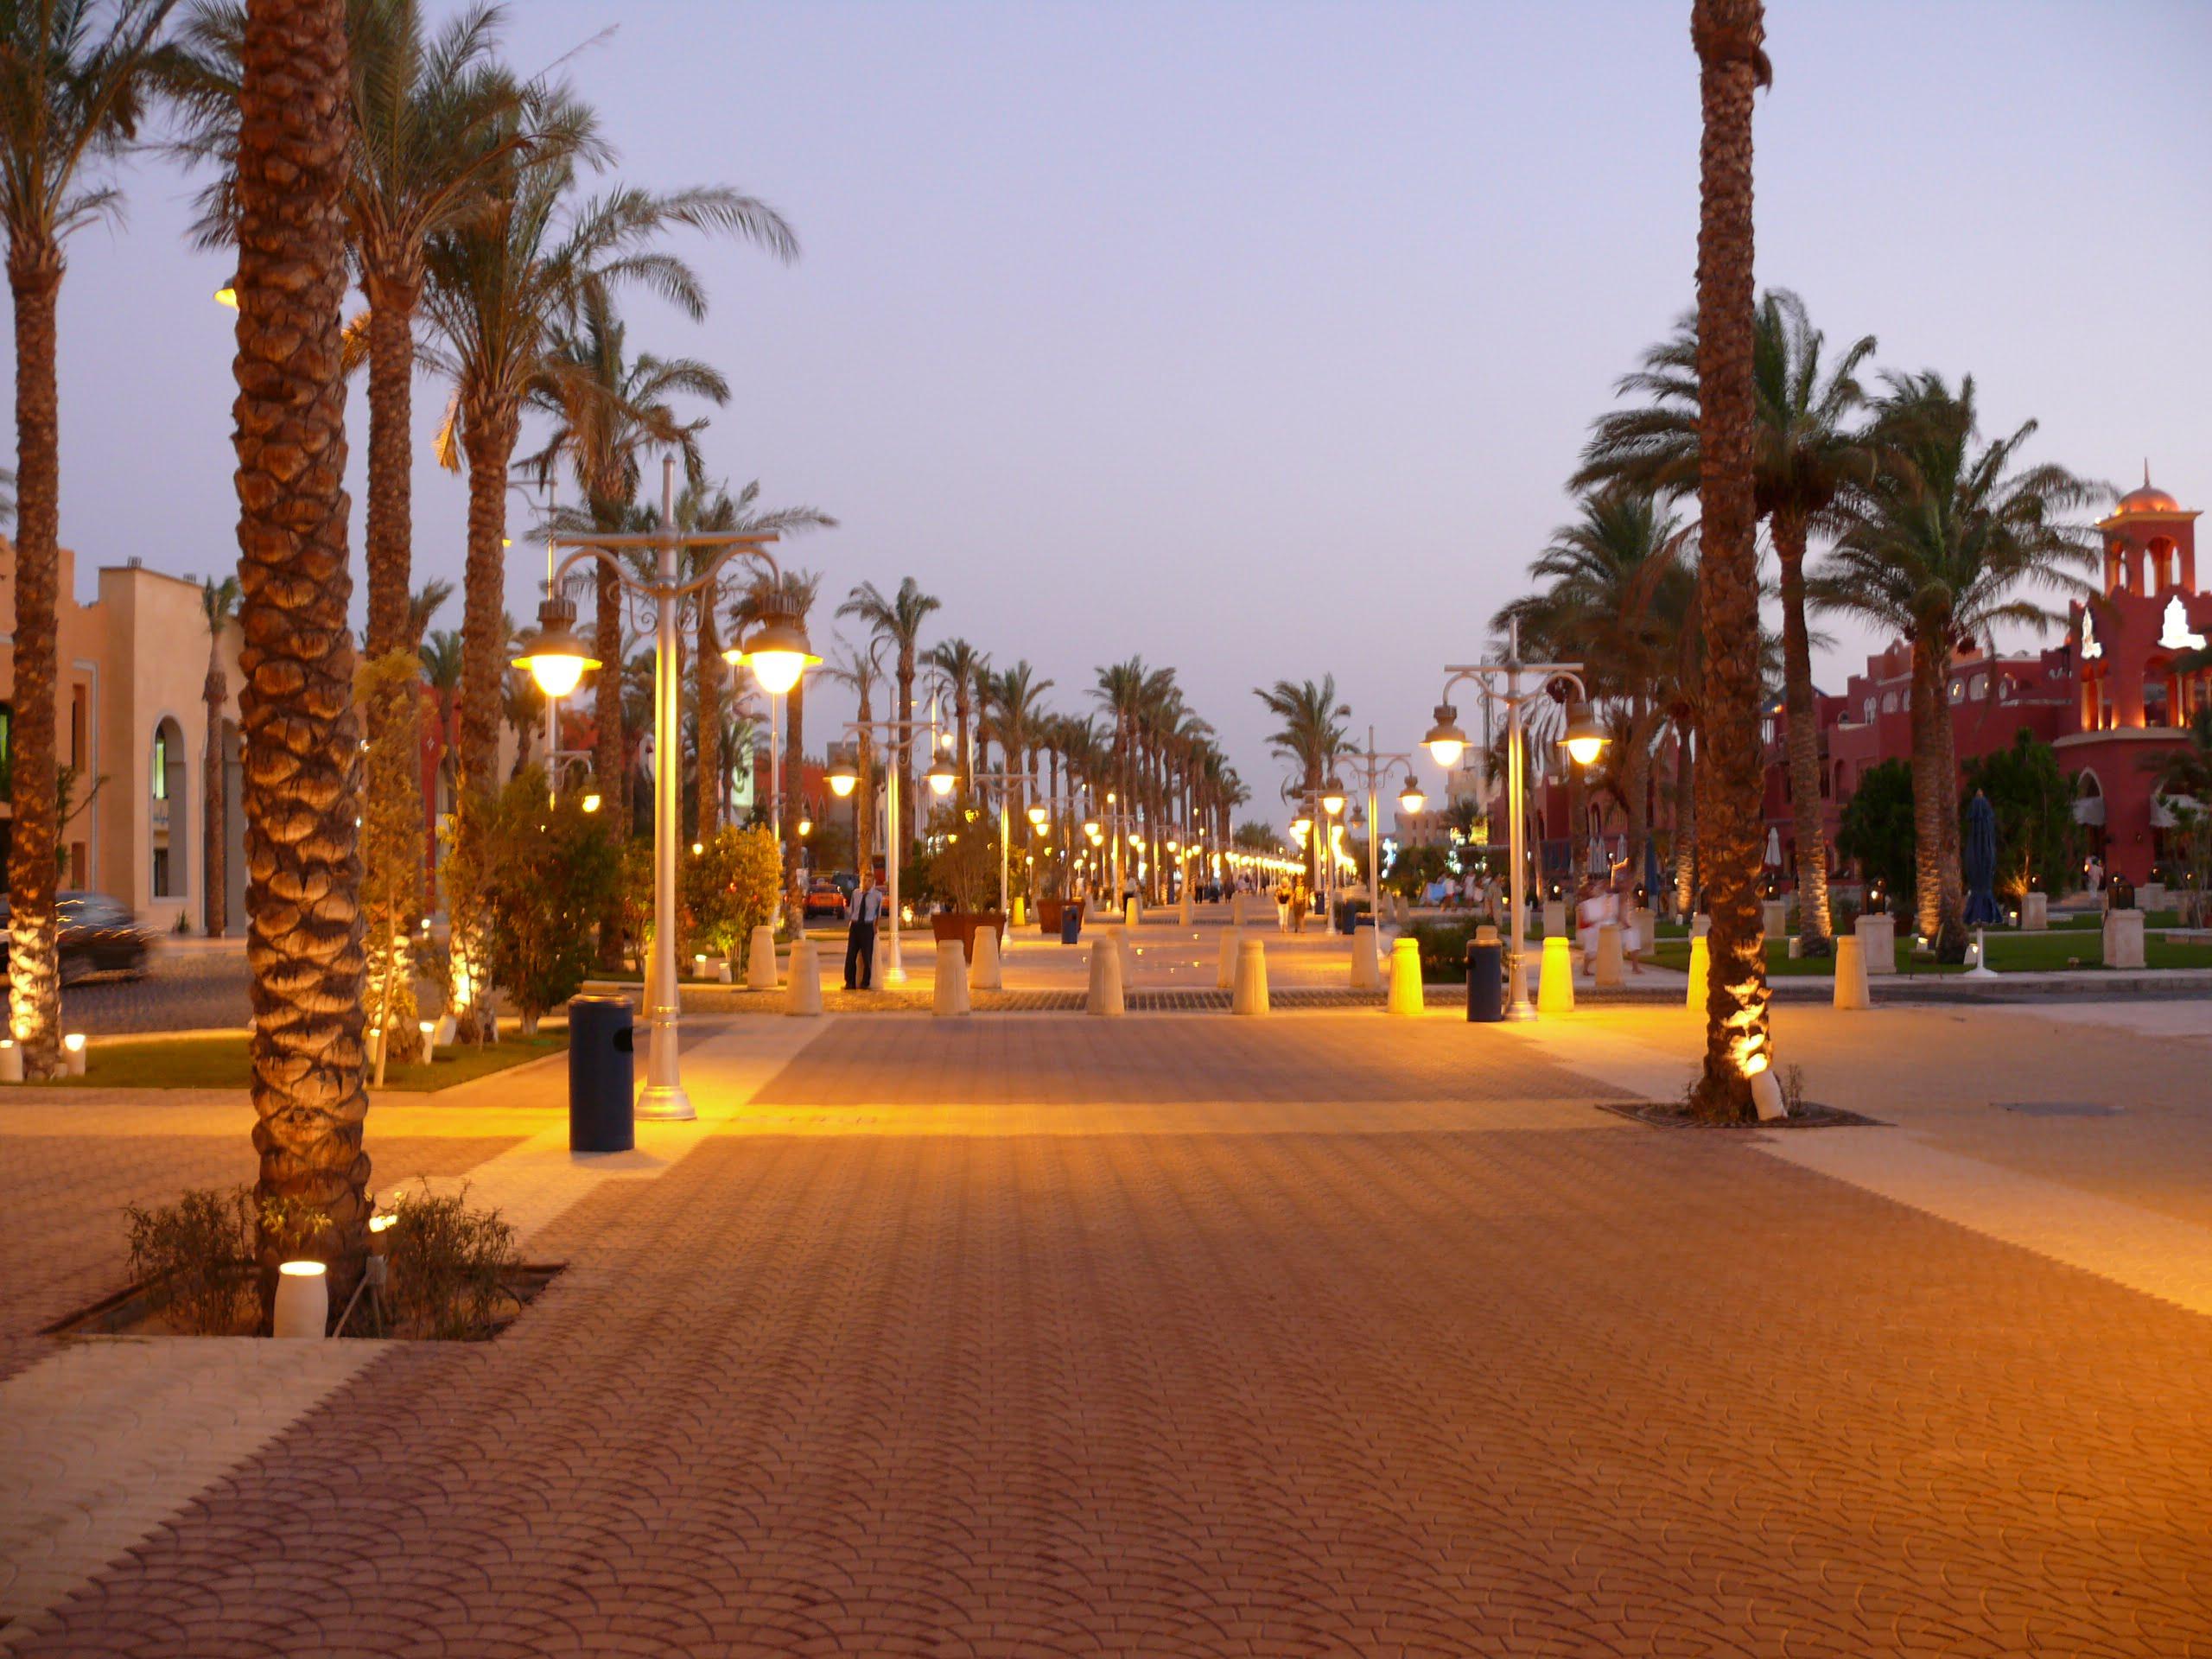 Alig_walk_way_hurghada_egypt_629